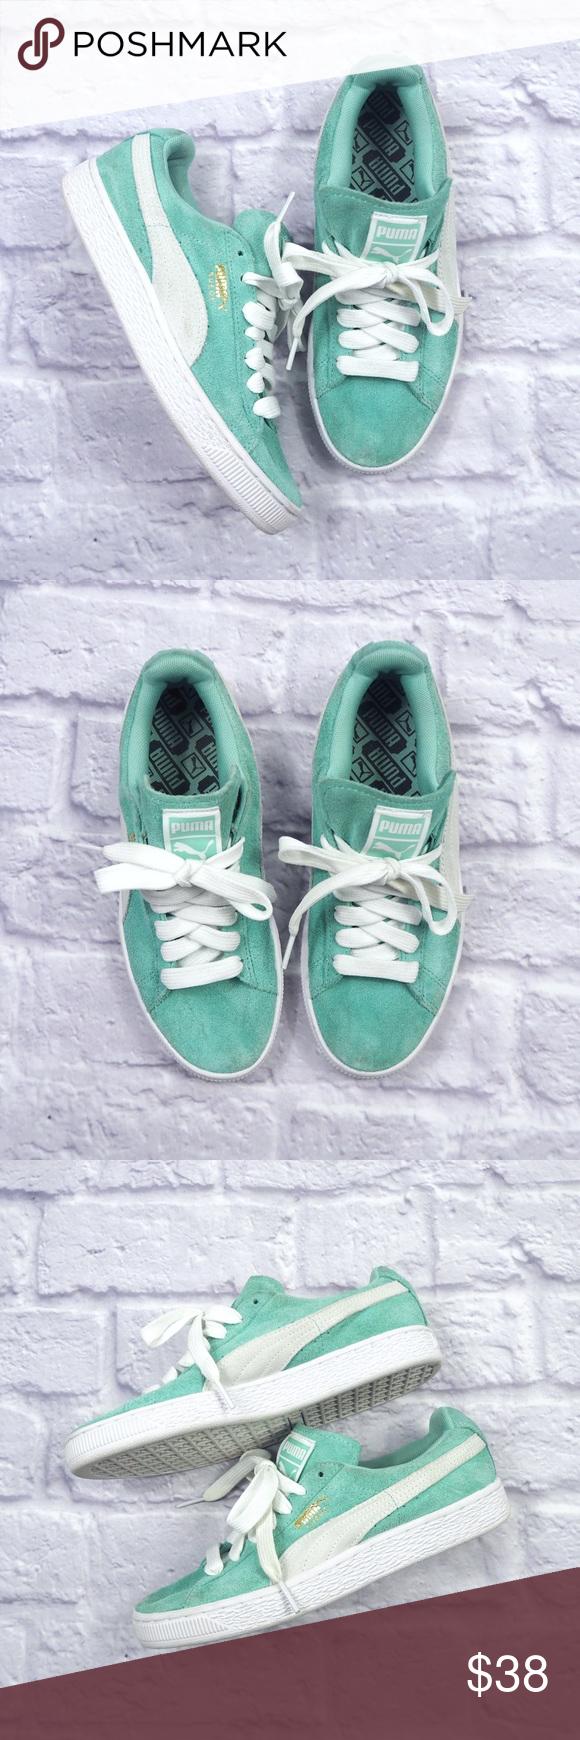 PUMA PLATFORM Suede Sneakers Seafoam